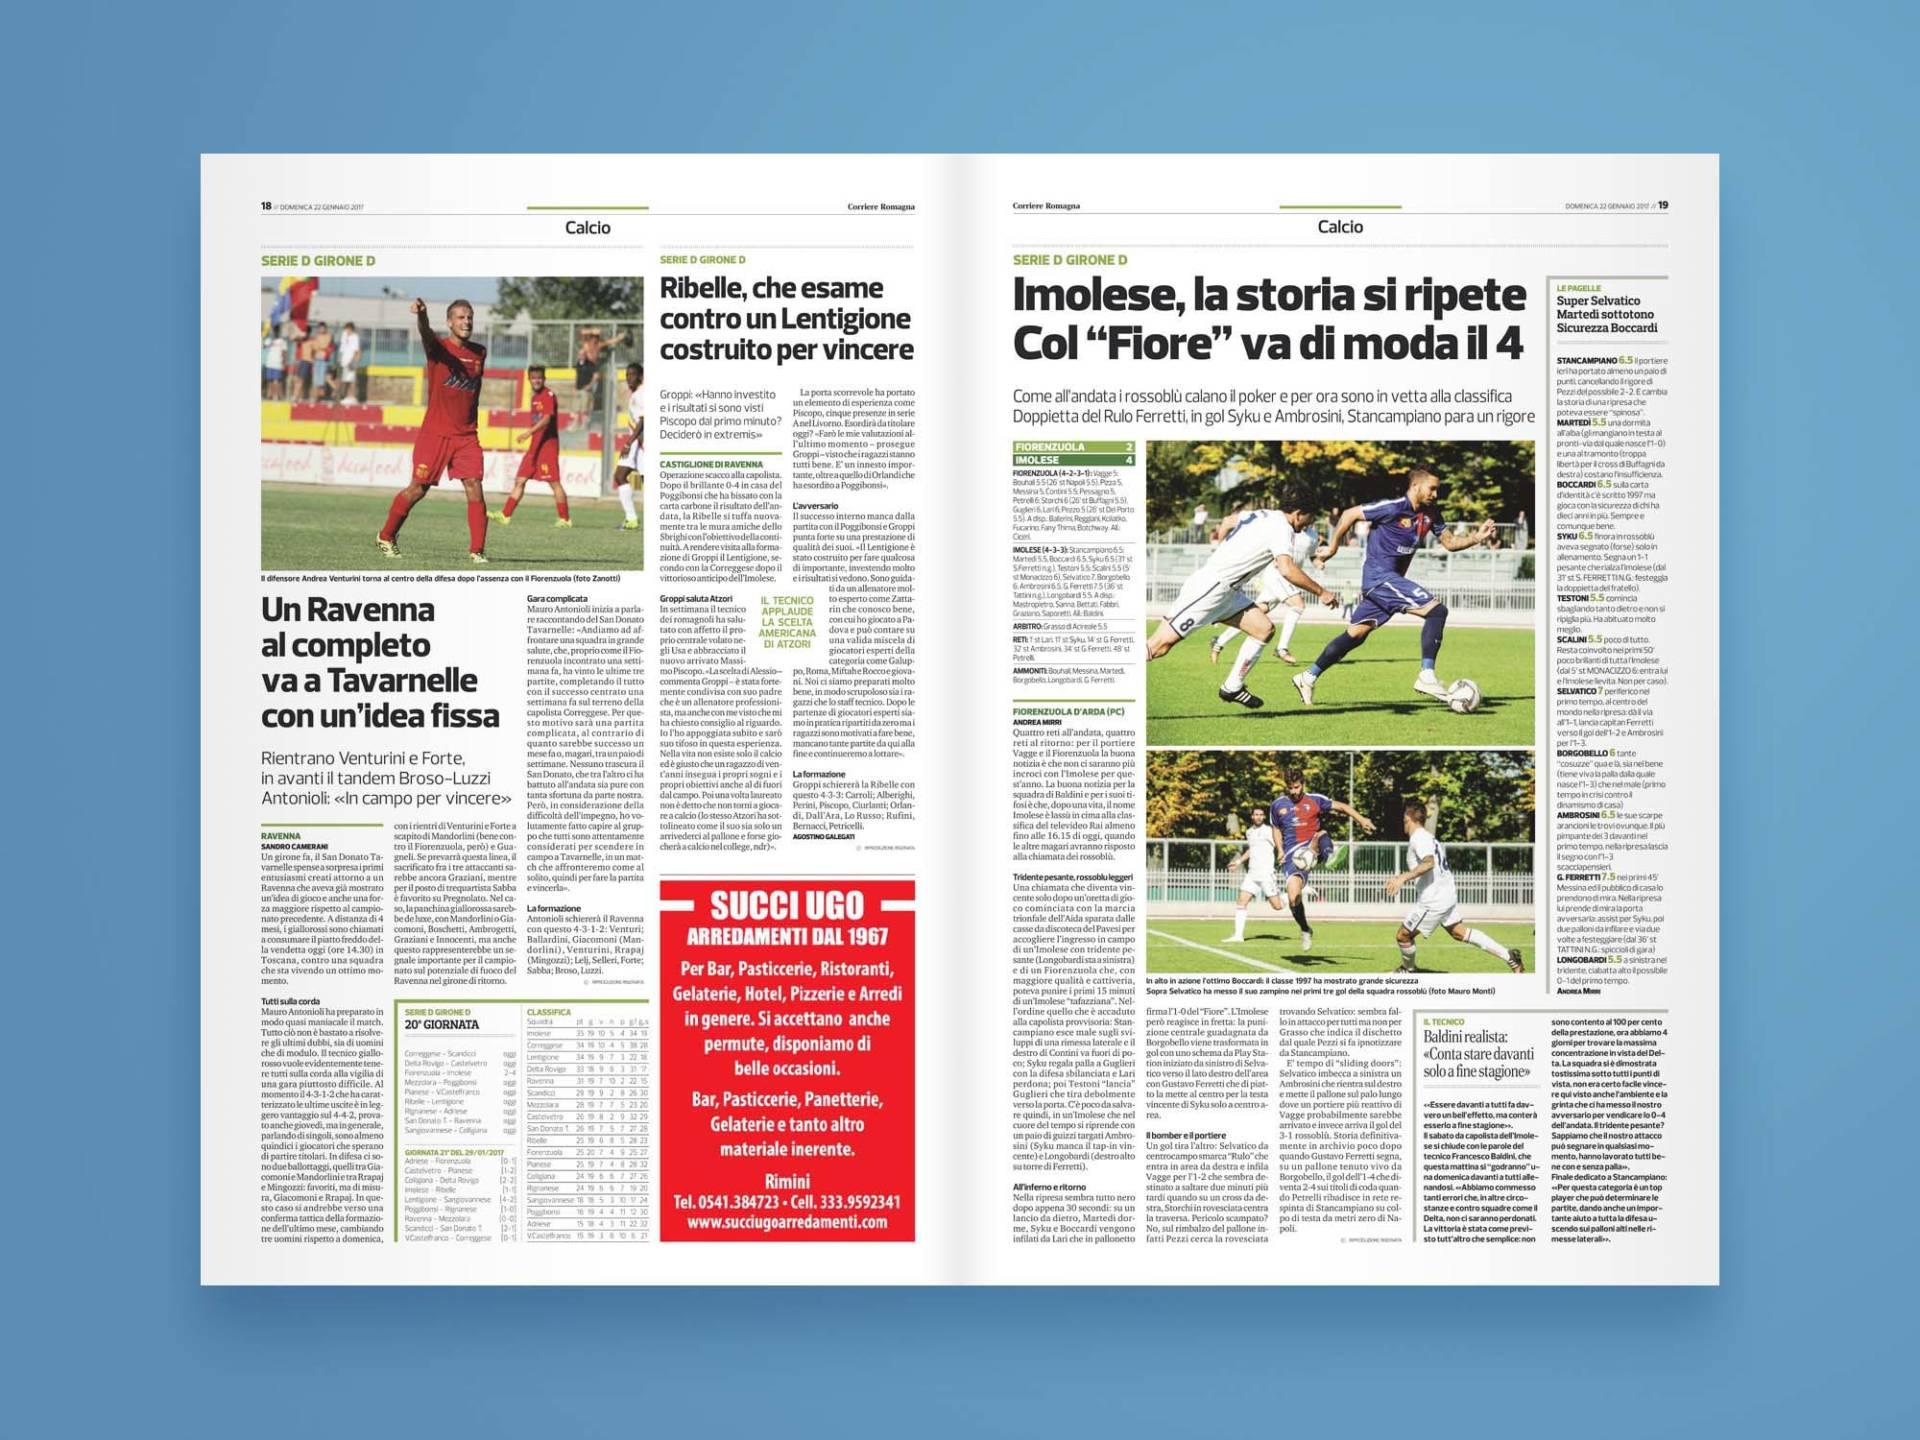 Corriere_Romagna_09_Wenceslau_News_Design